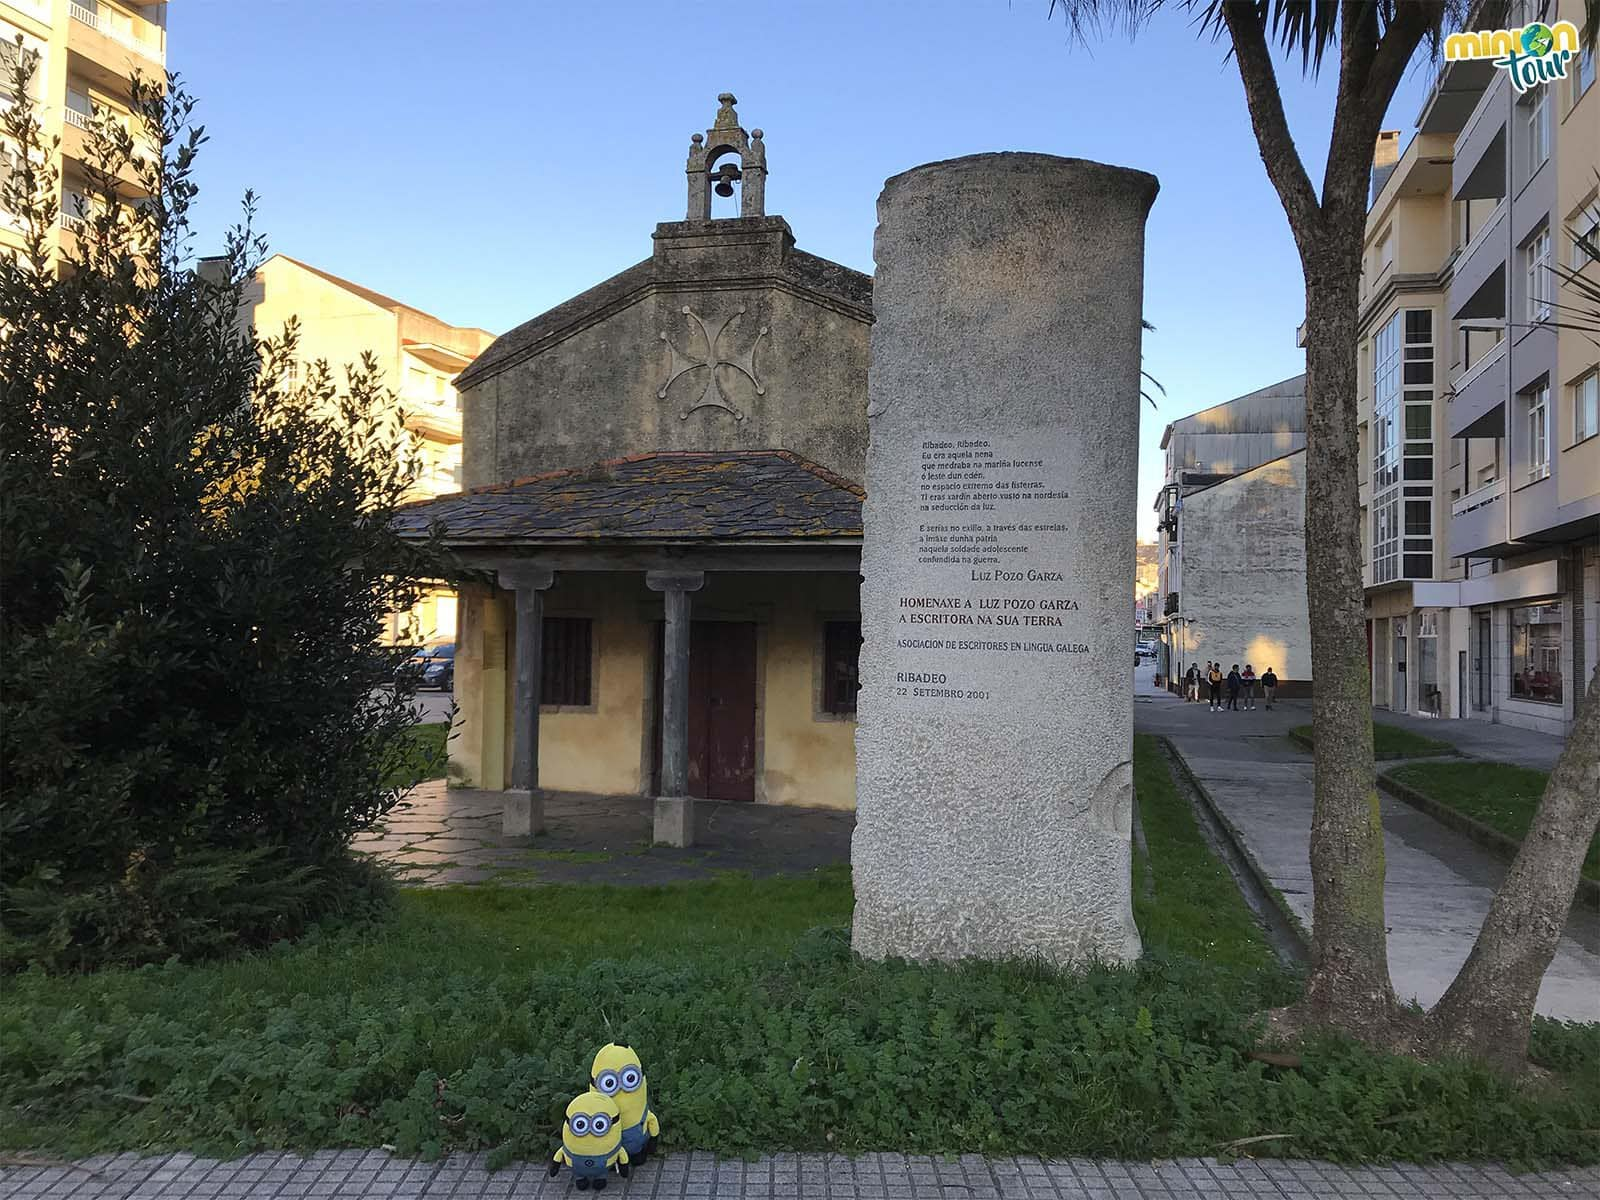 Minions en la Capilla de la Virgen del Camino